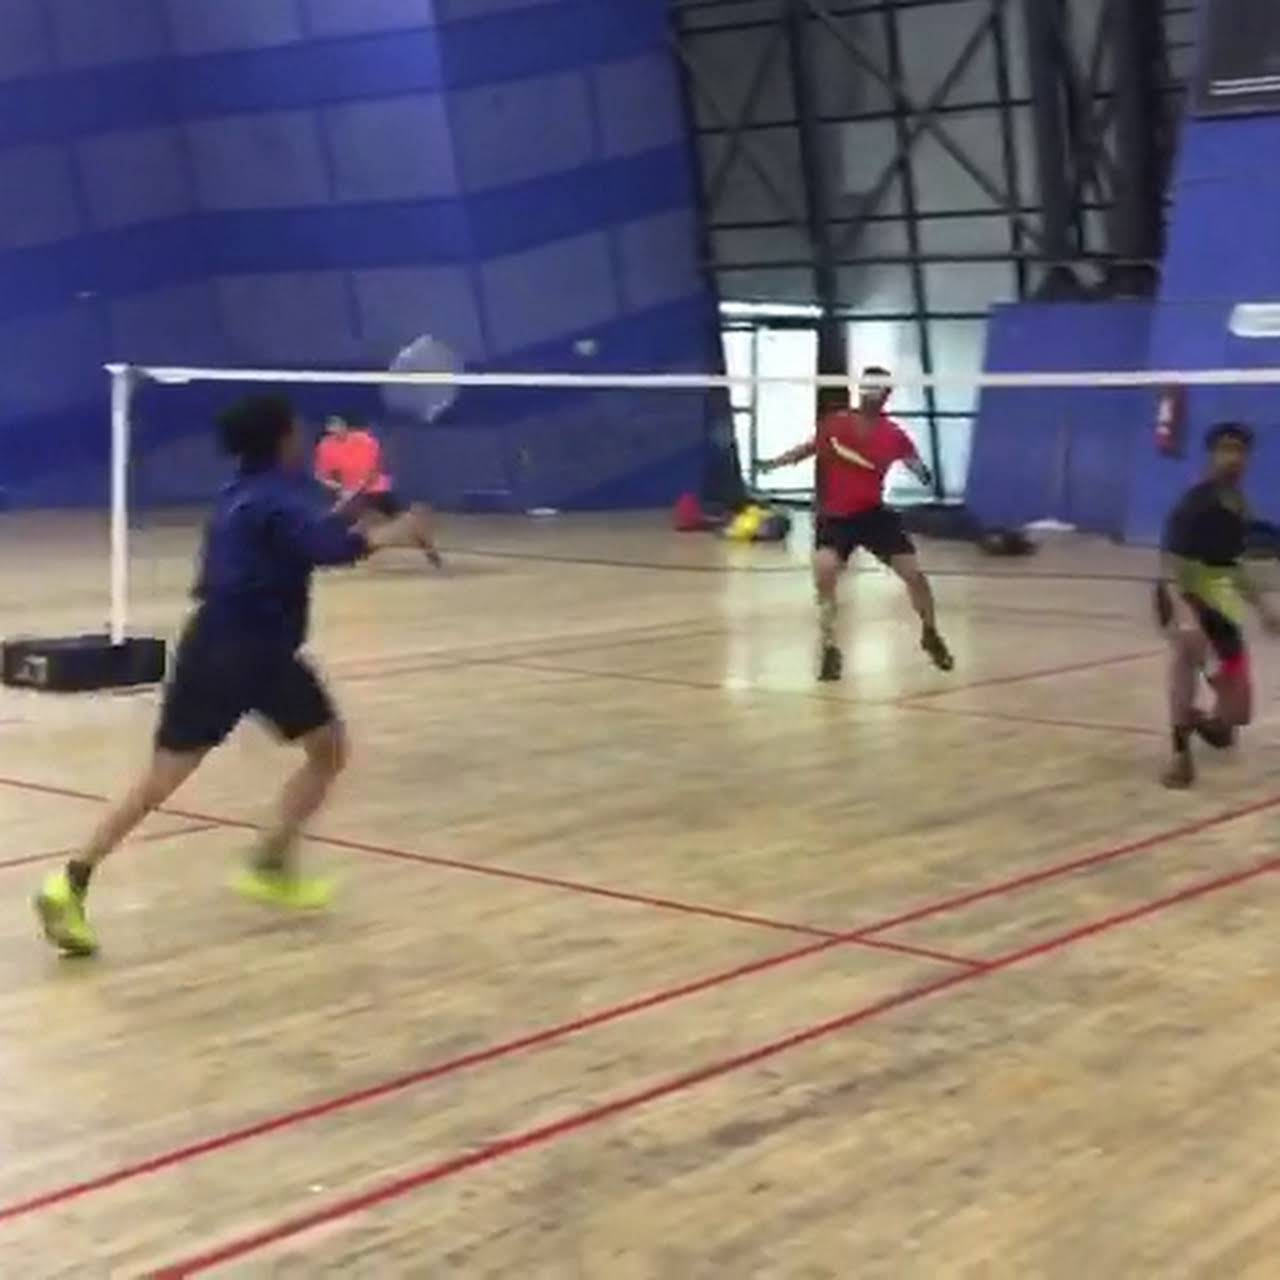 Surjit Singh Badminton Academy CWG - Badminton Court in ...